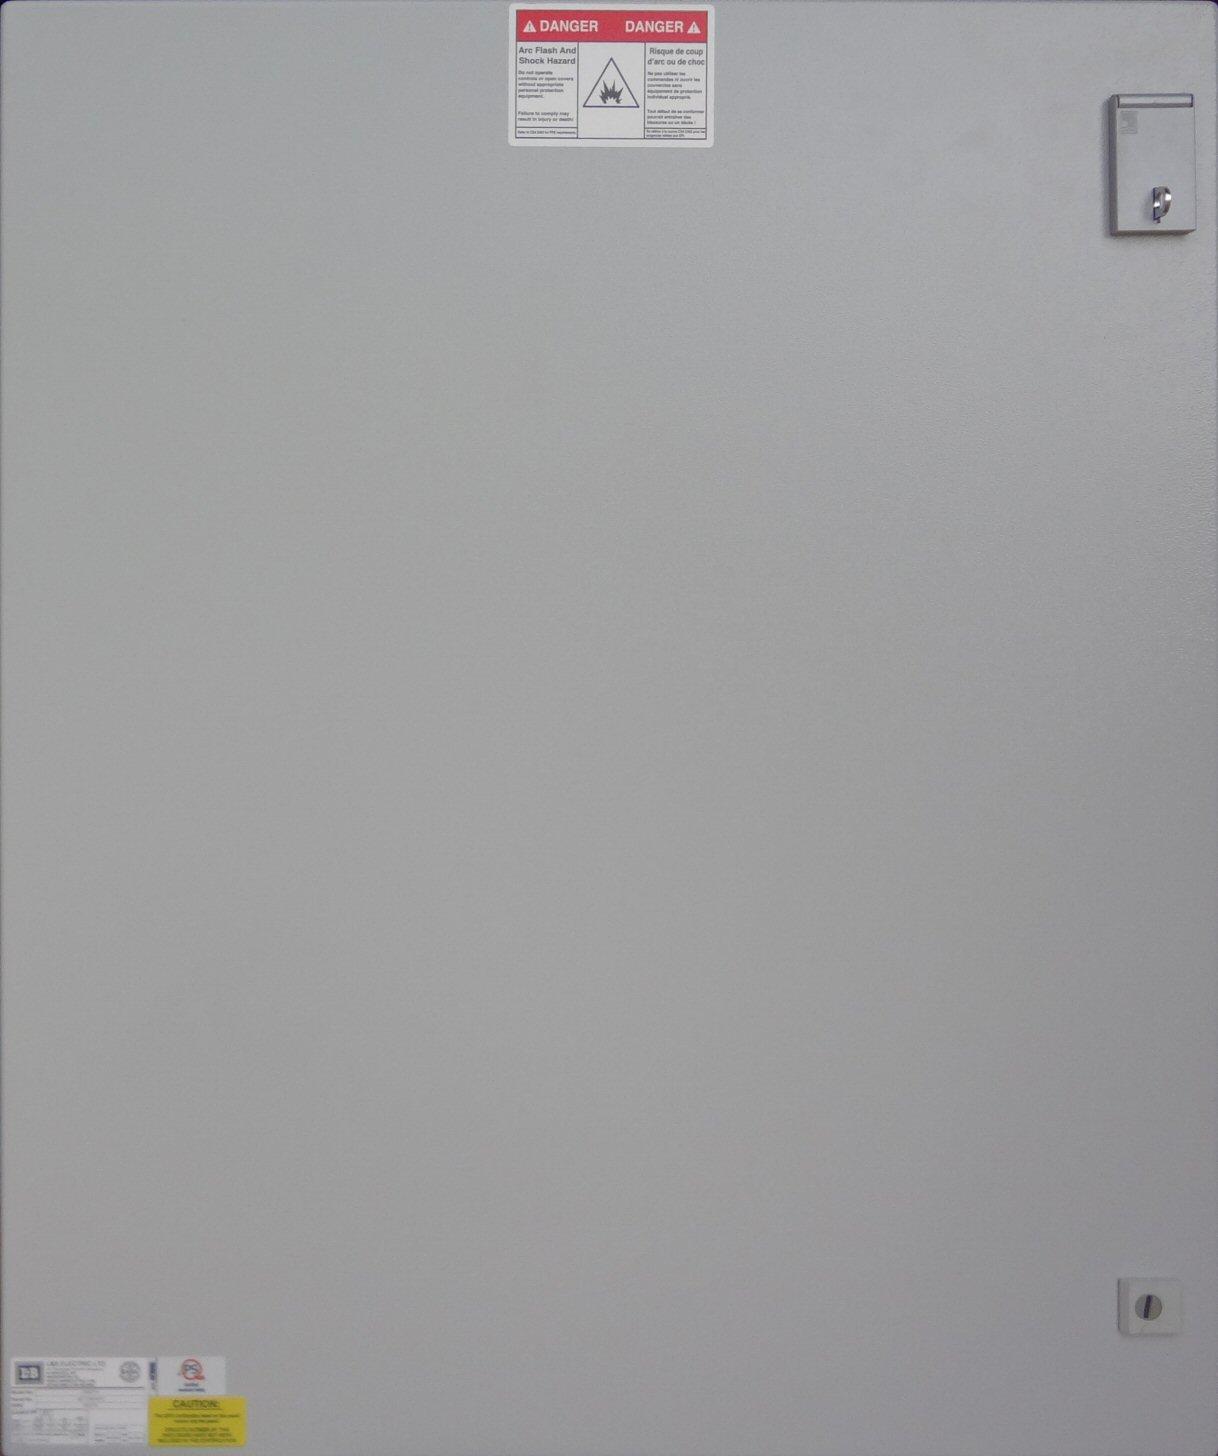 Custom Control Panels Toshiba Drives And Motors G7 Wiring Diagram Municipal Pumping Station